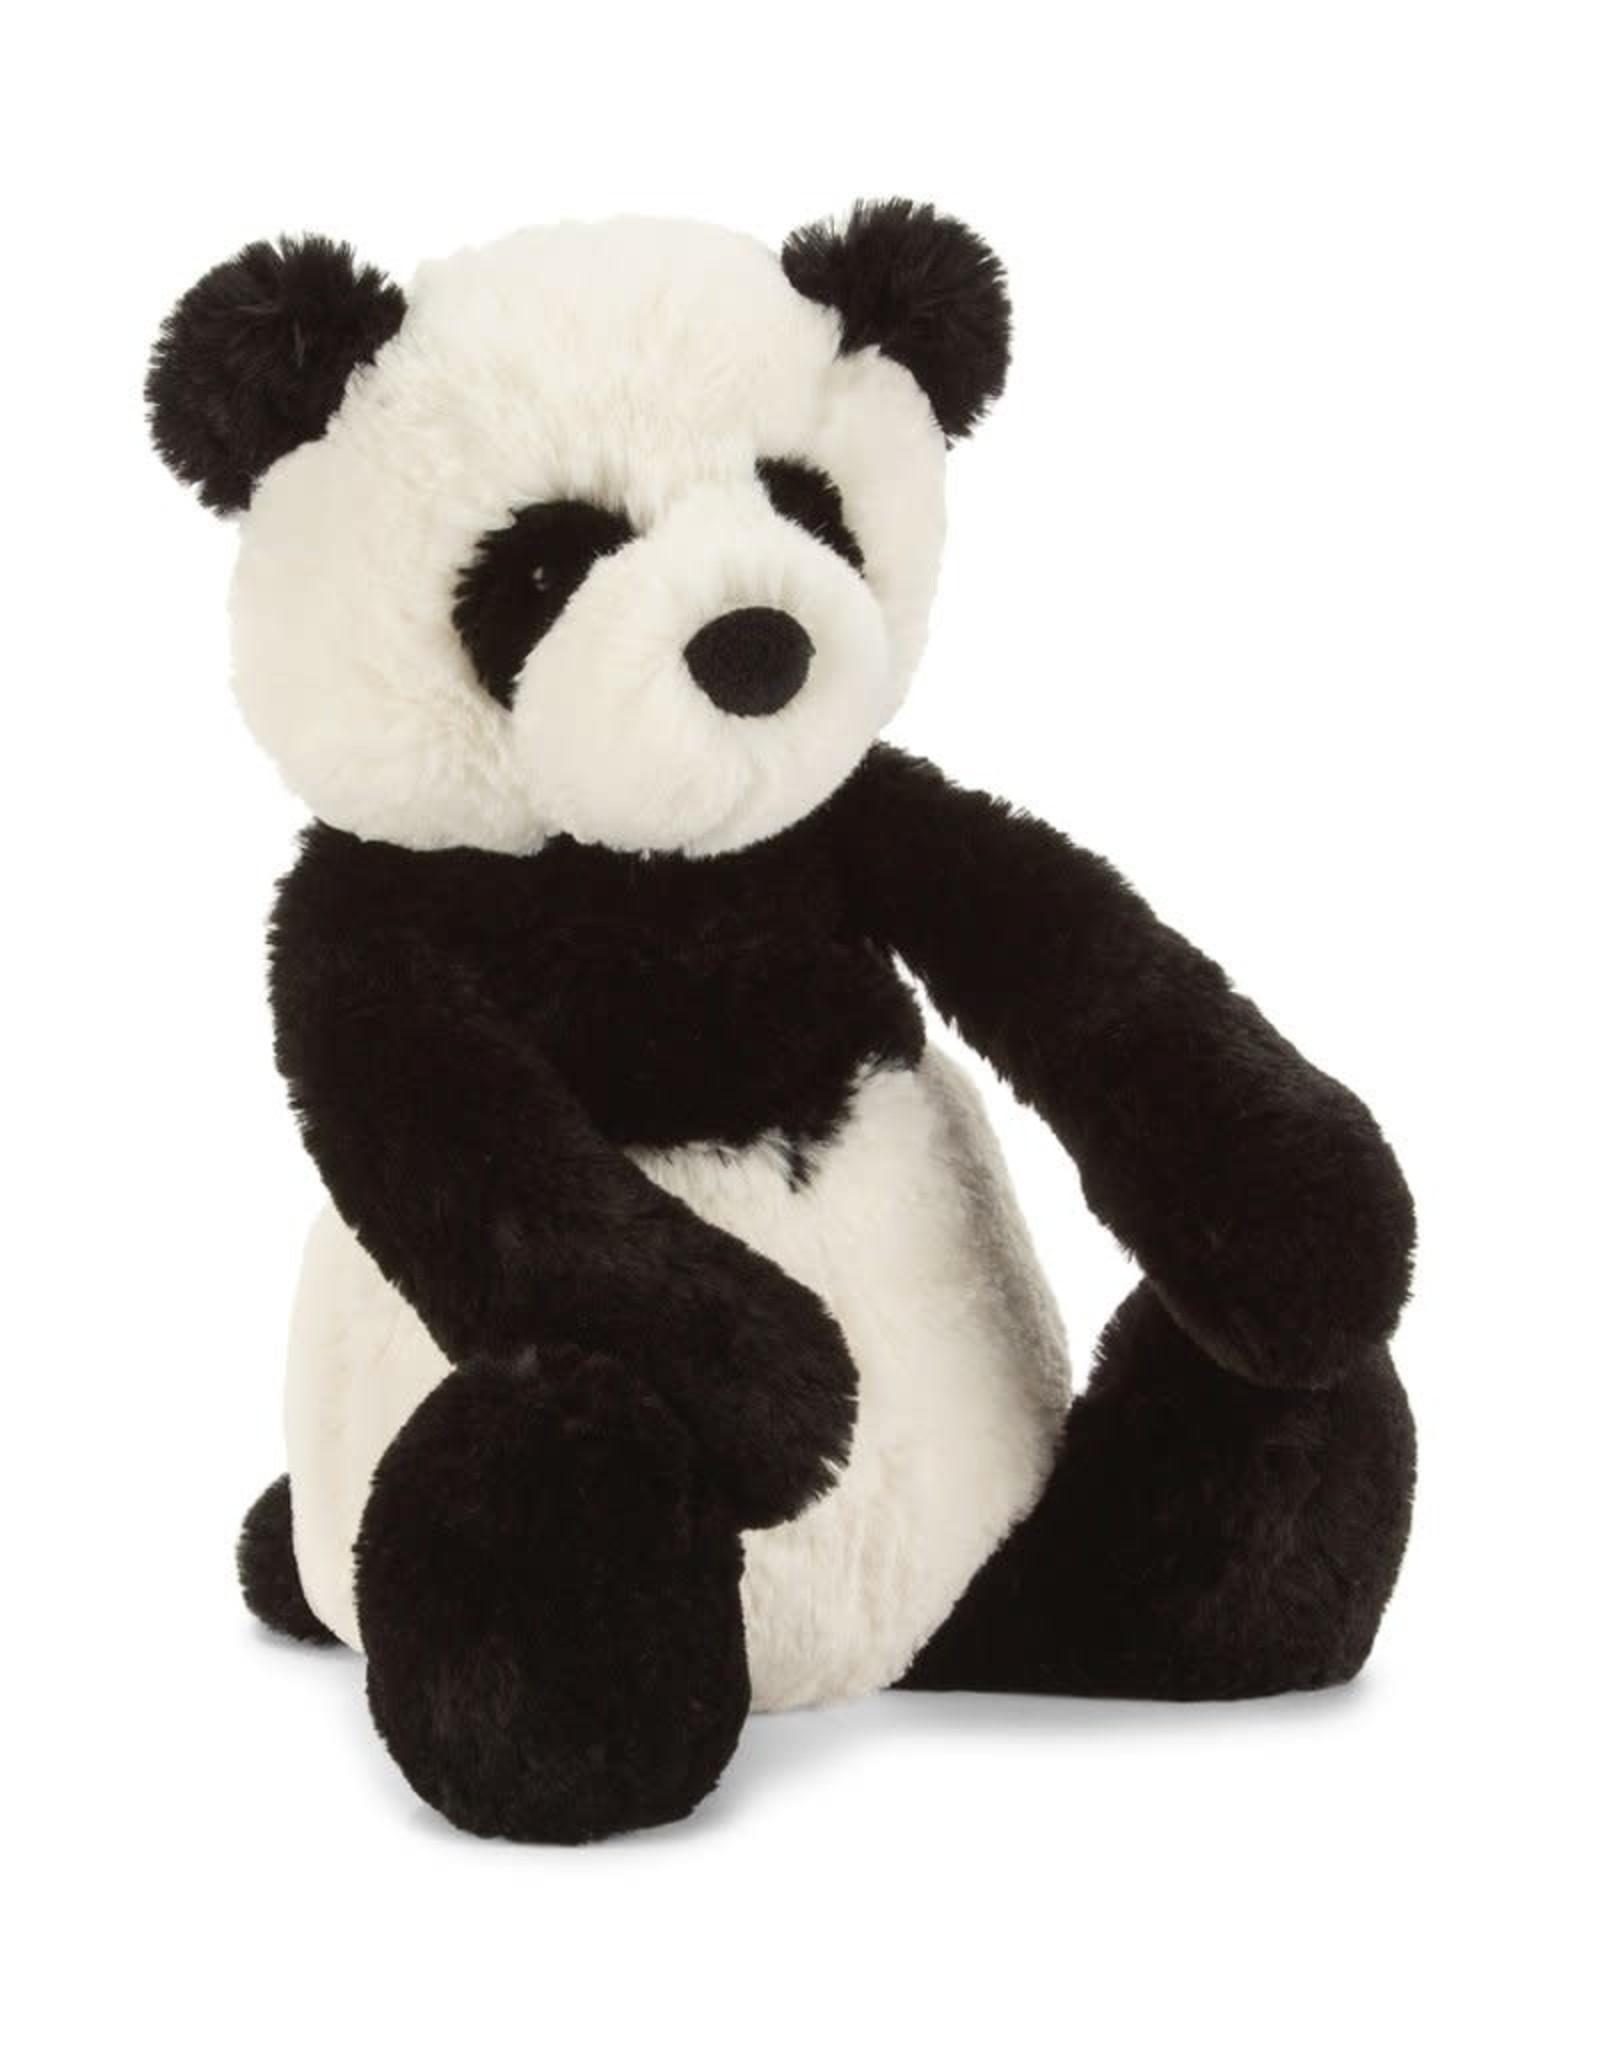 Jellycat Bashful Panda Cub